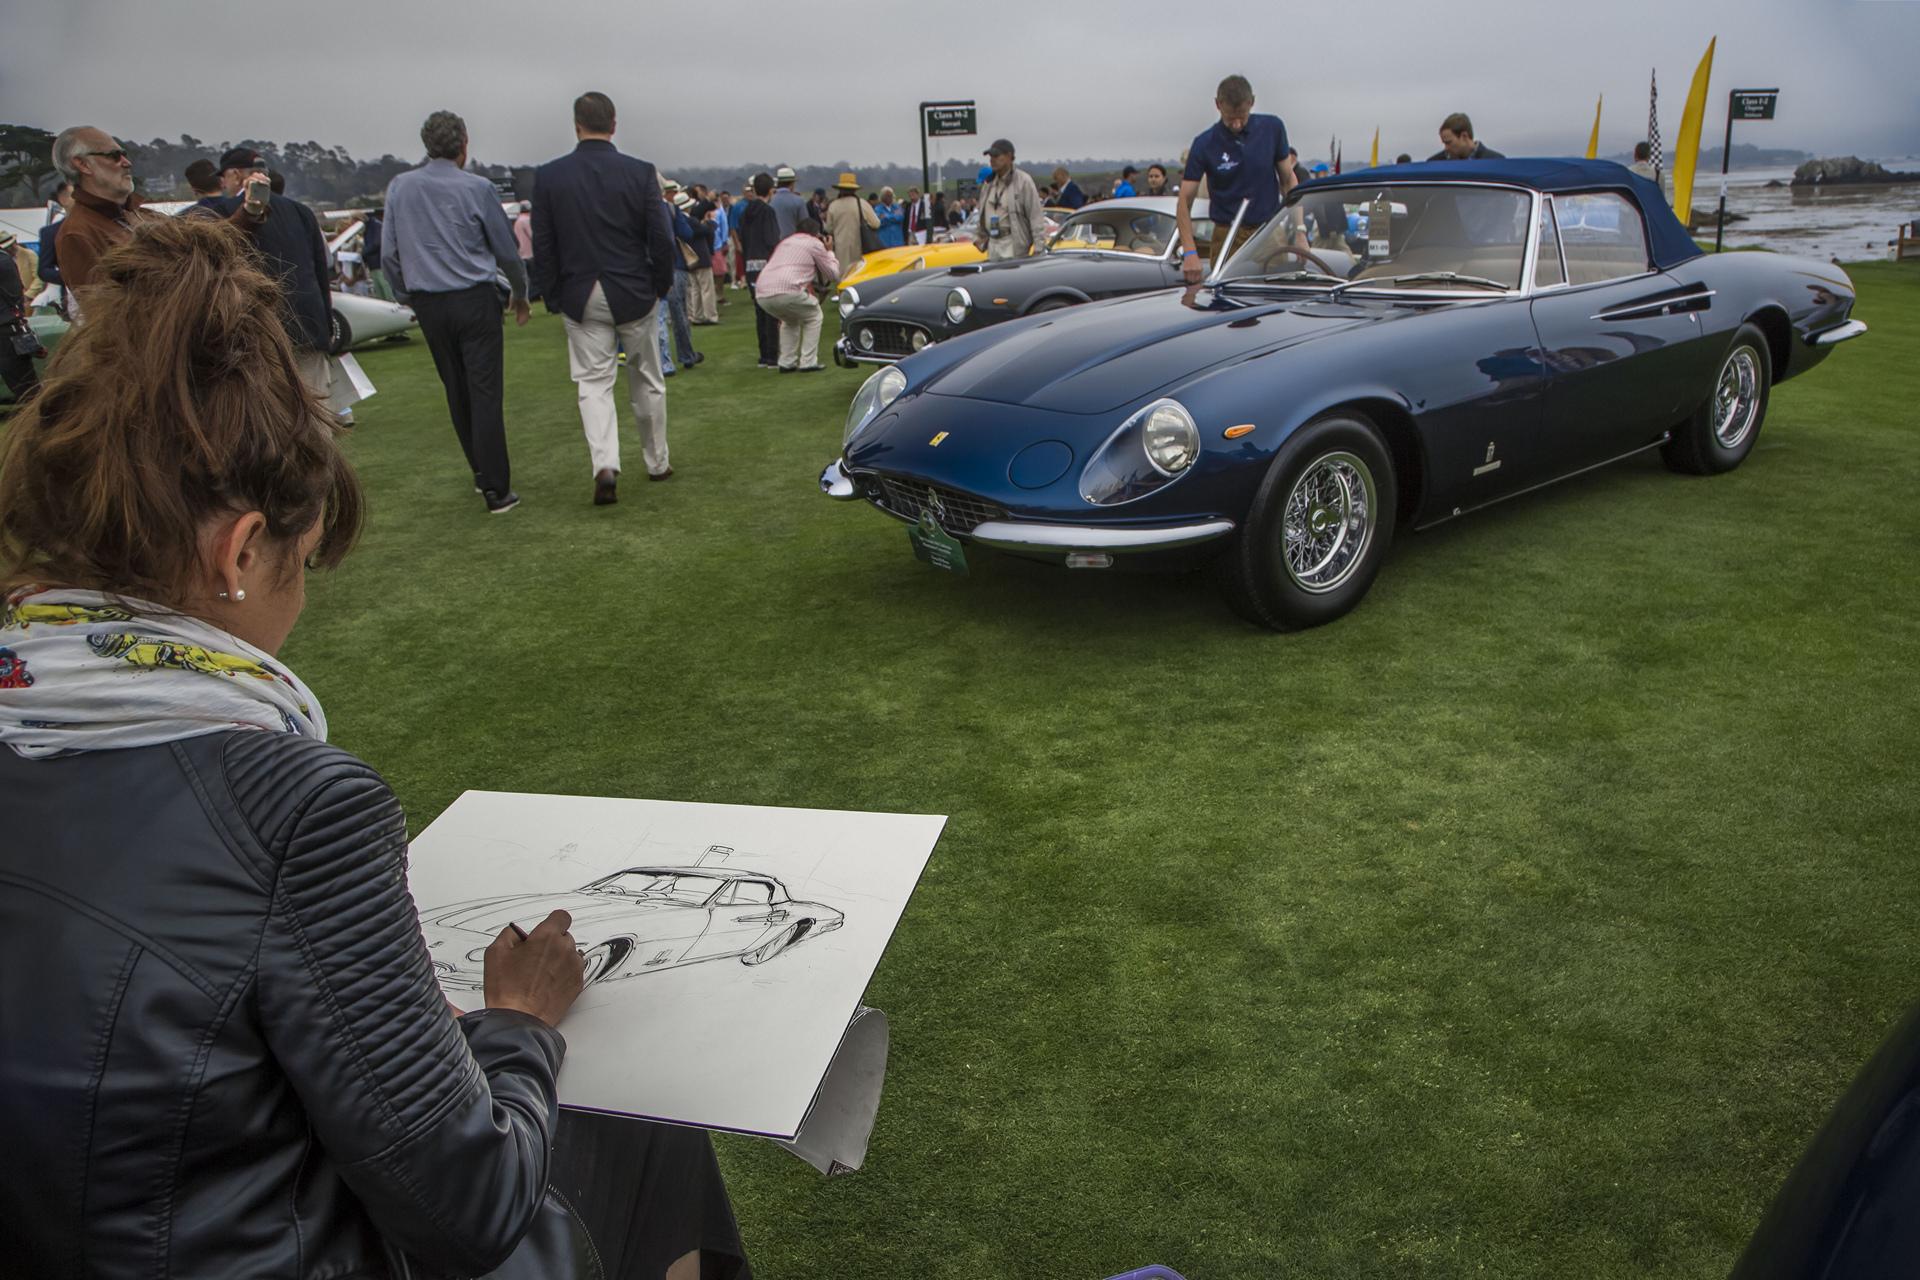 Pebble Beach Concours d'Elegance 2016 © Fiat Chrysler Automobiles N.V.